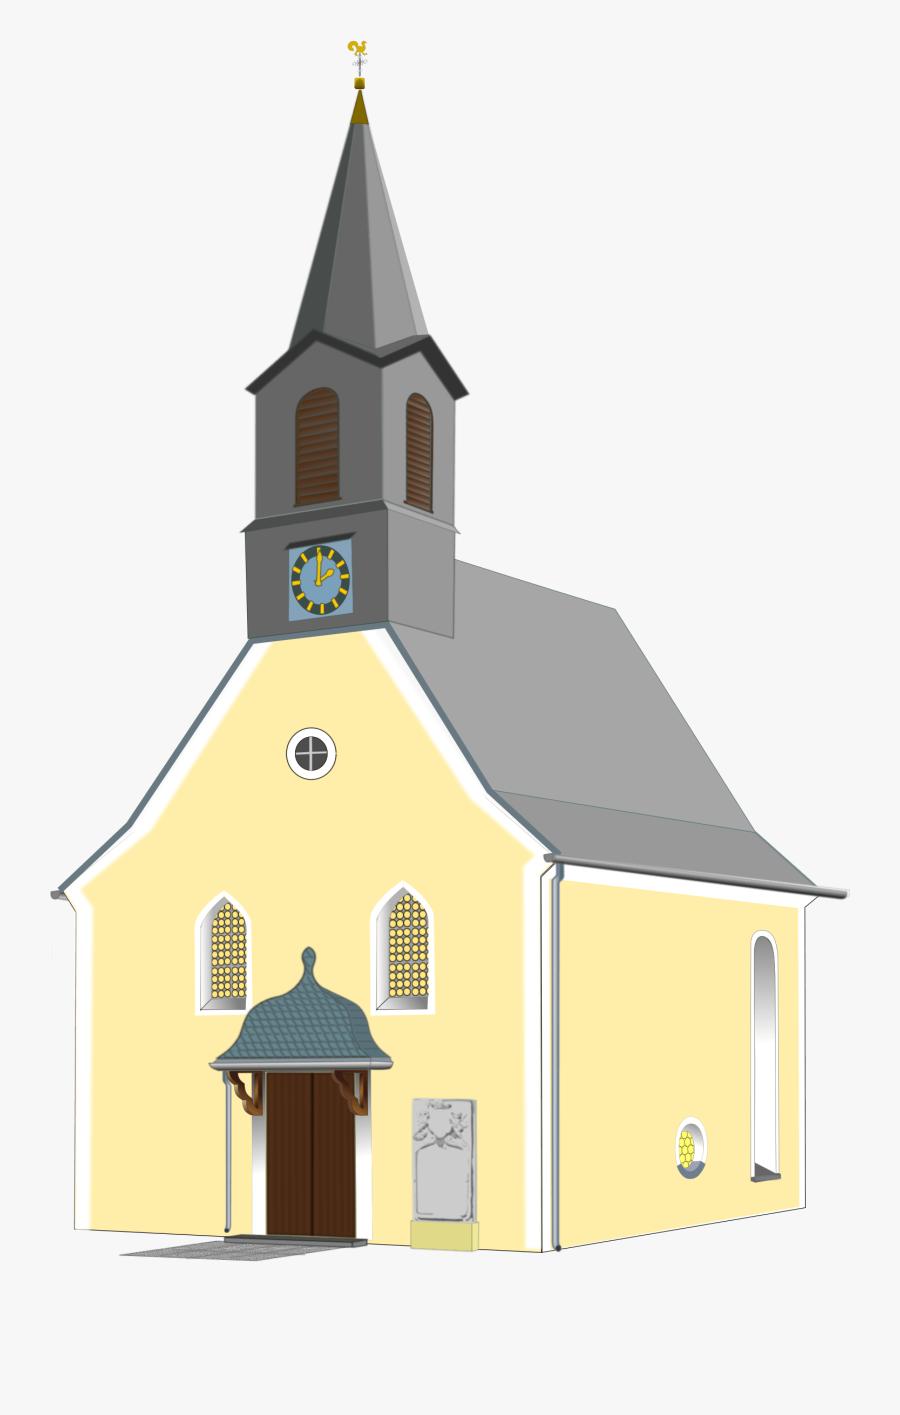 Clip Art Portable Network Graphics Christian Church - Transparent Background Church Transparent, Transparent Clipart